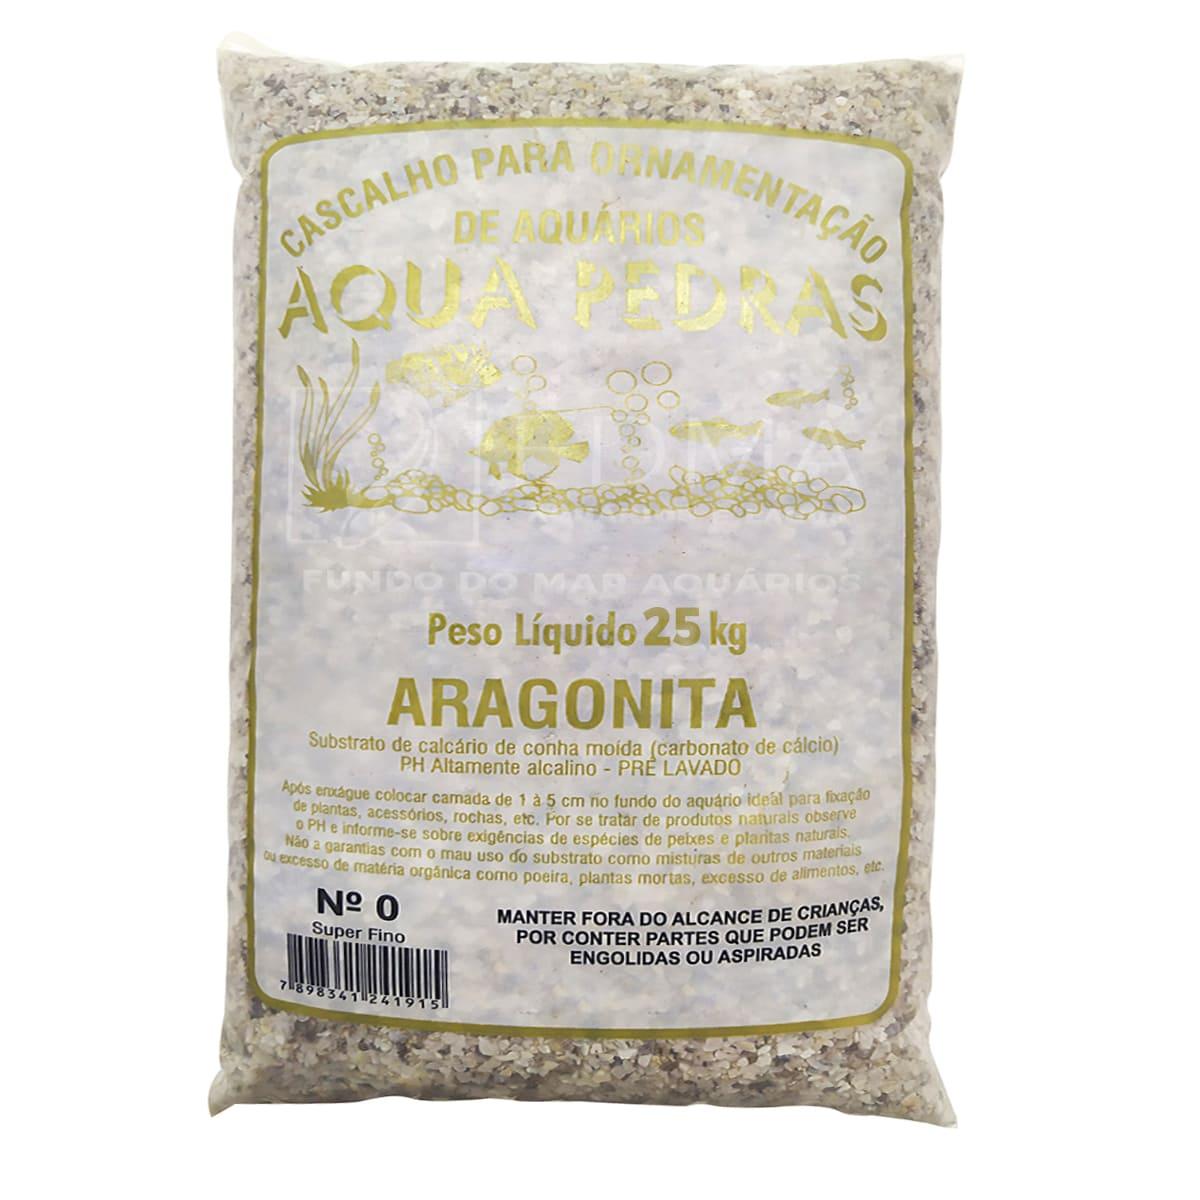 Substrato Aragonita para Aquários e Jardins N°0 - 25kg